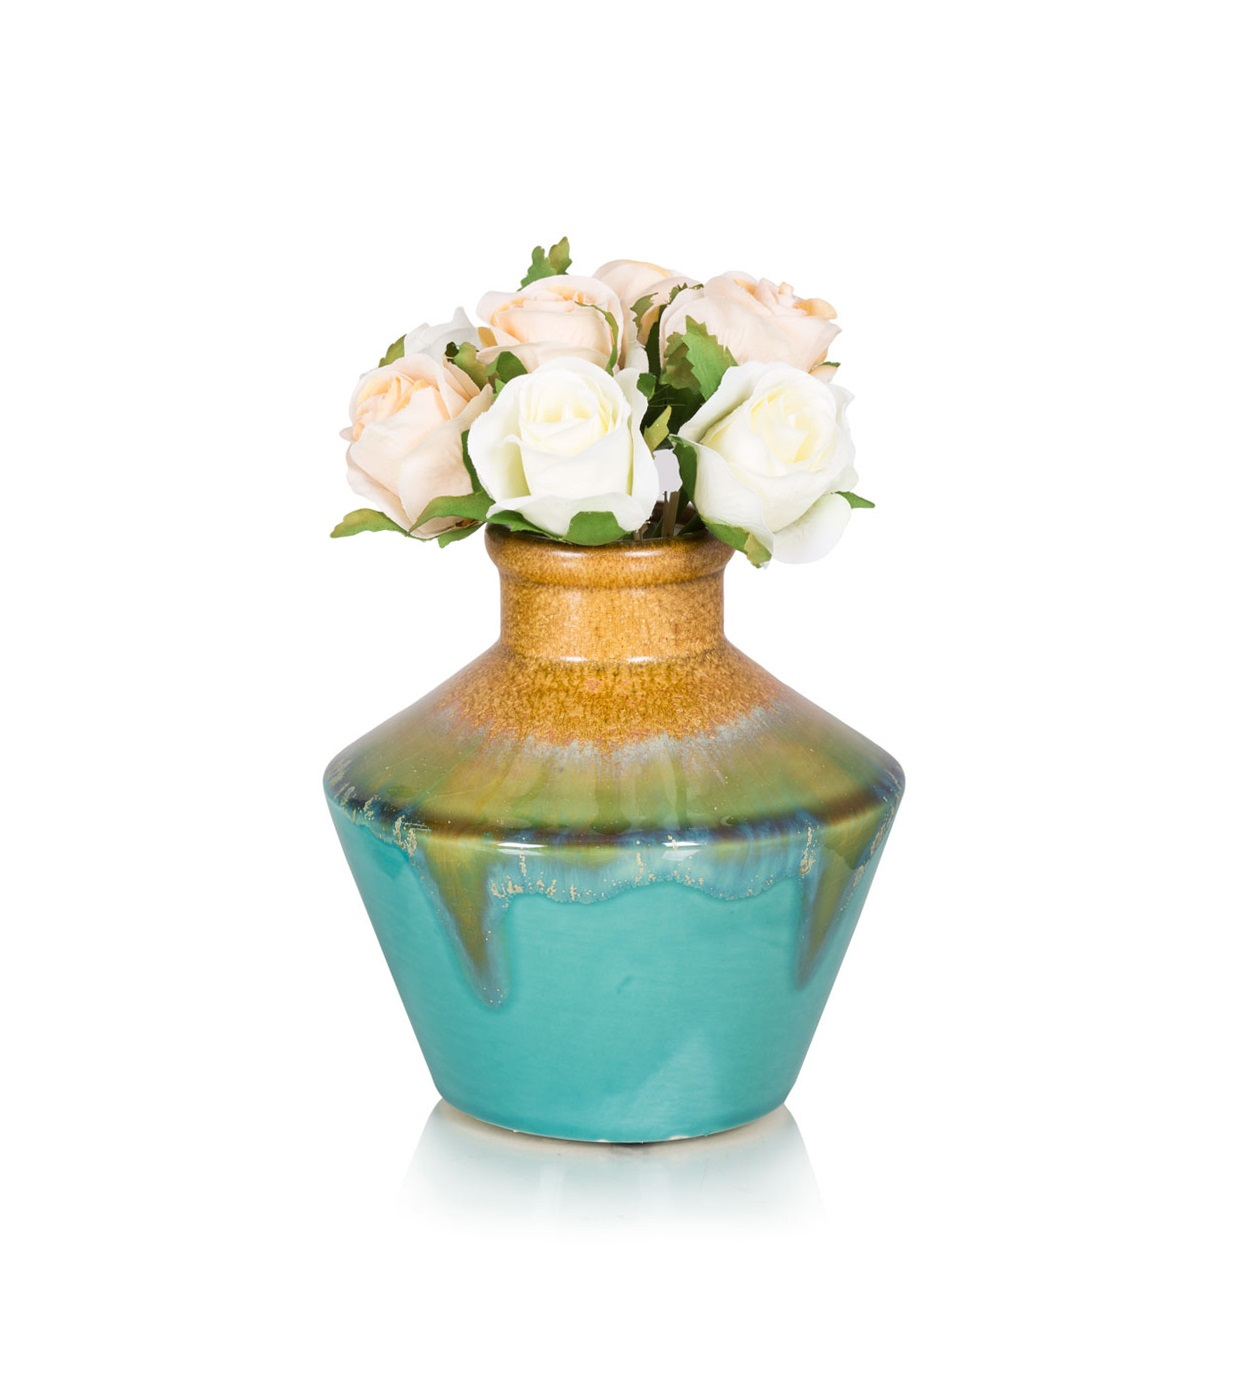 {} Home Philosophy Ваза Evien Цвет: Бирюзовый-Бежевый (14х15 см) home philosophy ваза mariana цвет молочный набор